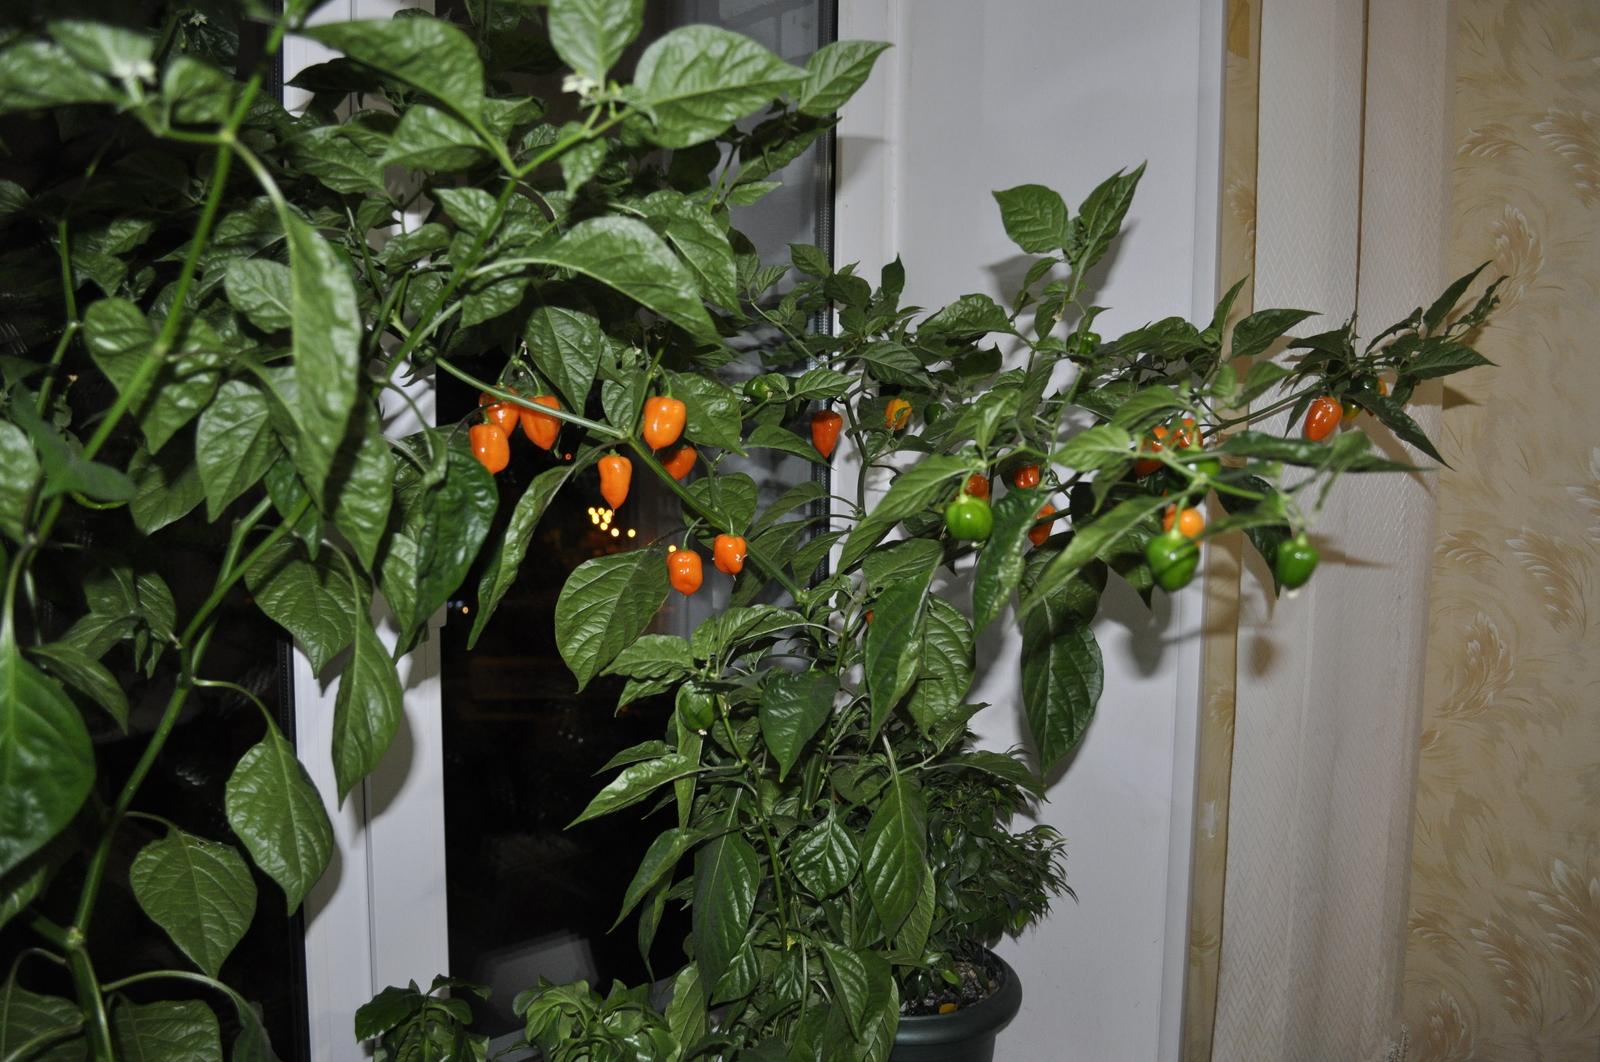 перец хабанеро выращивание